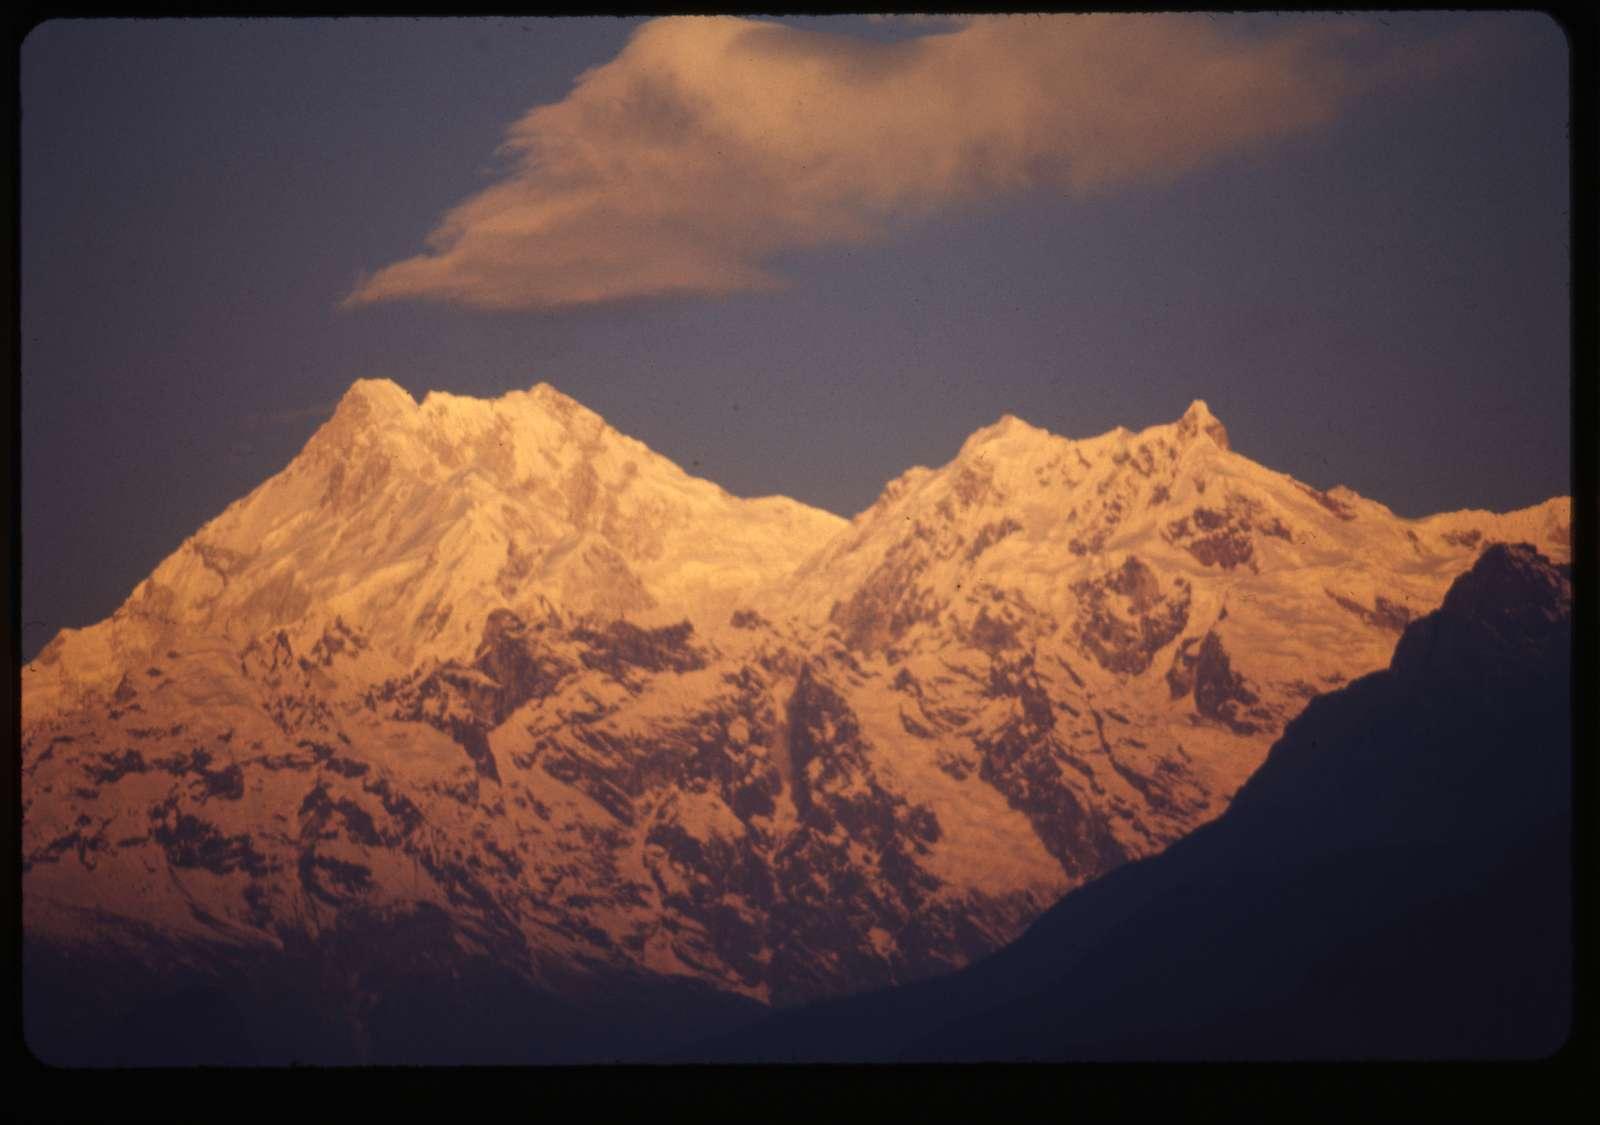 [Mount Kānchenjunga, third highest mountain in the world]